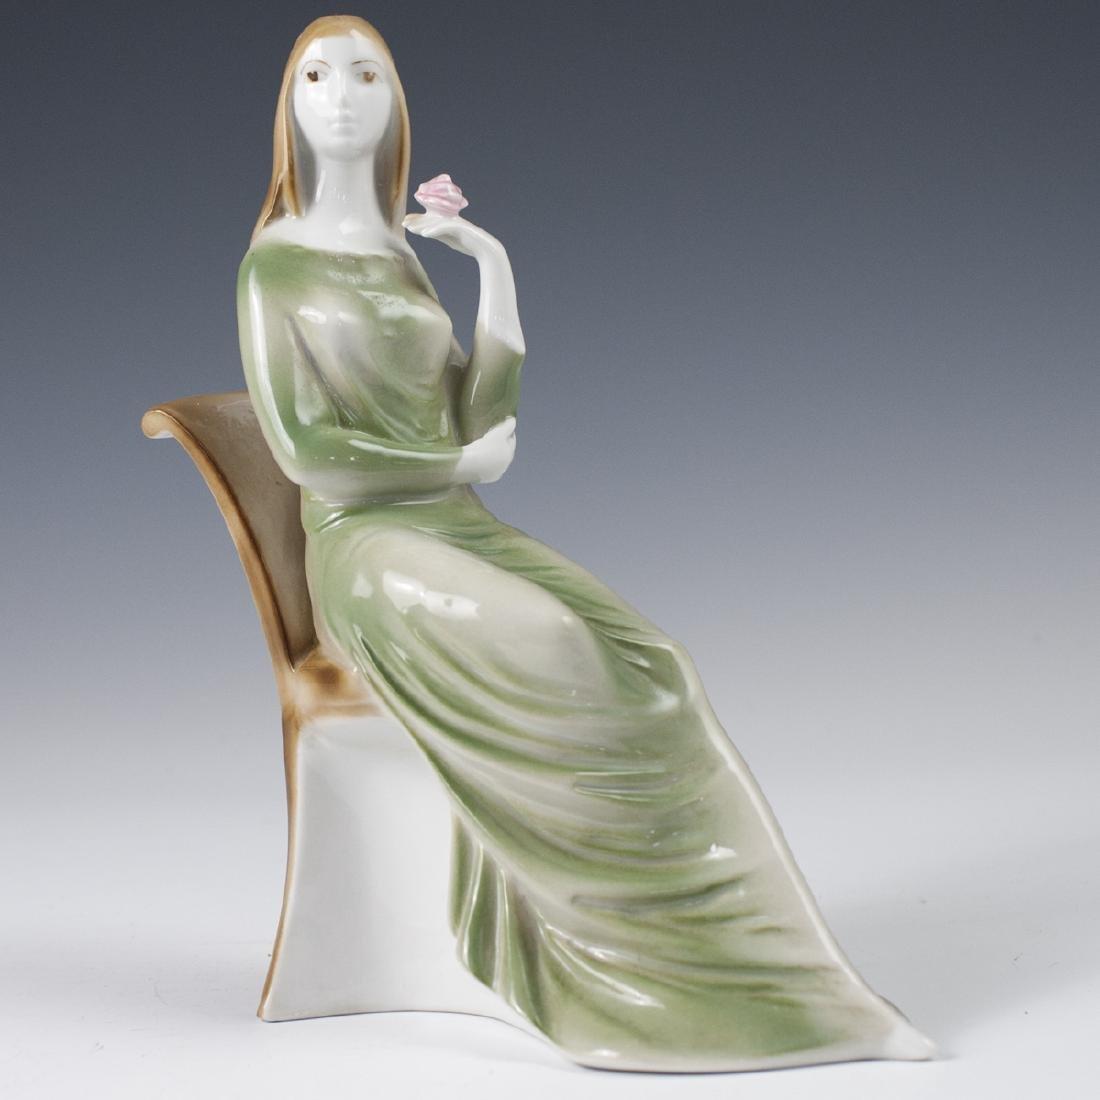 Zsolnay Porcelain Figurine